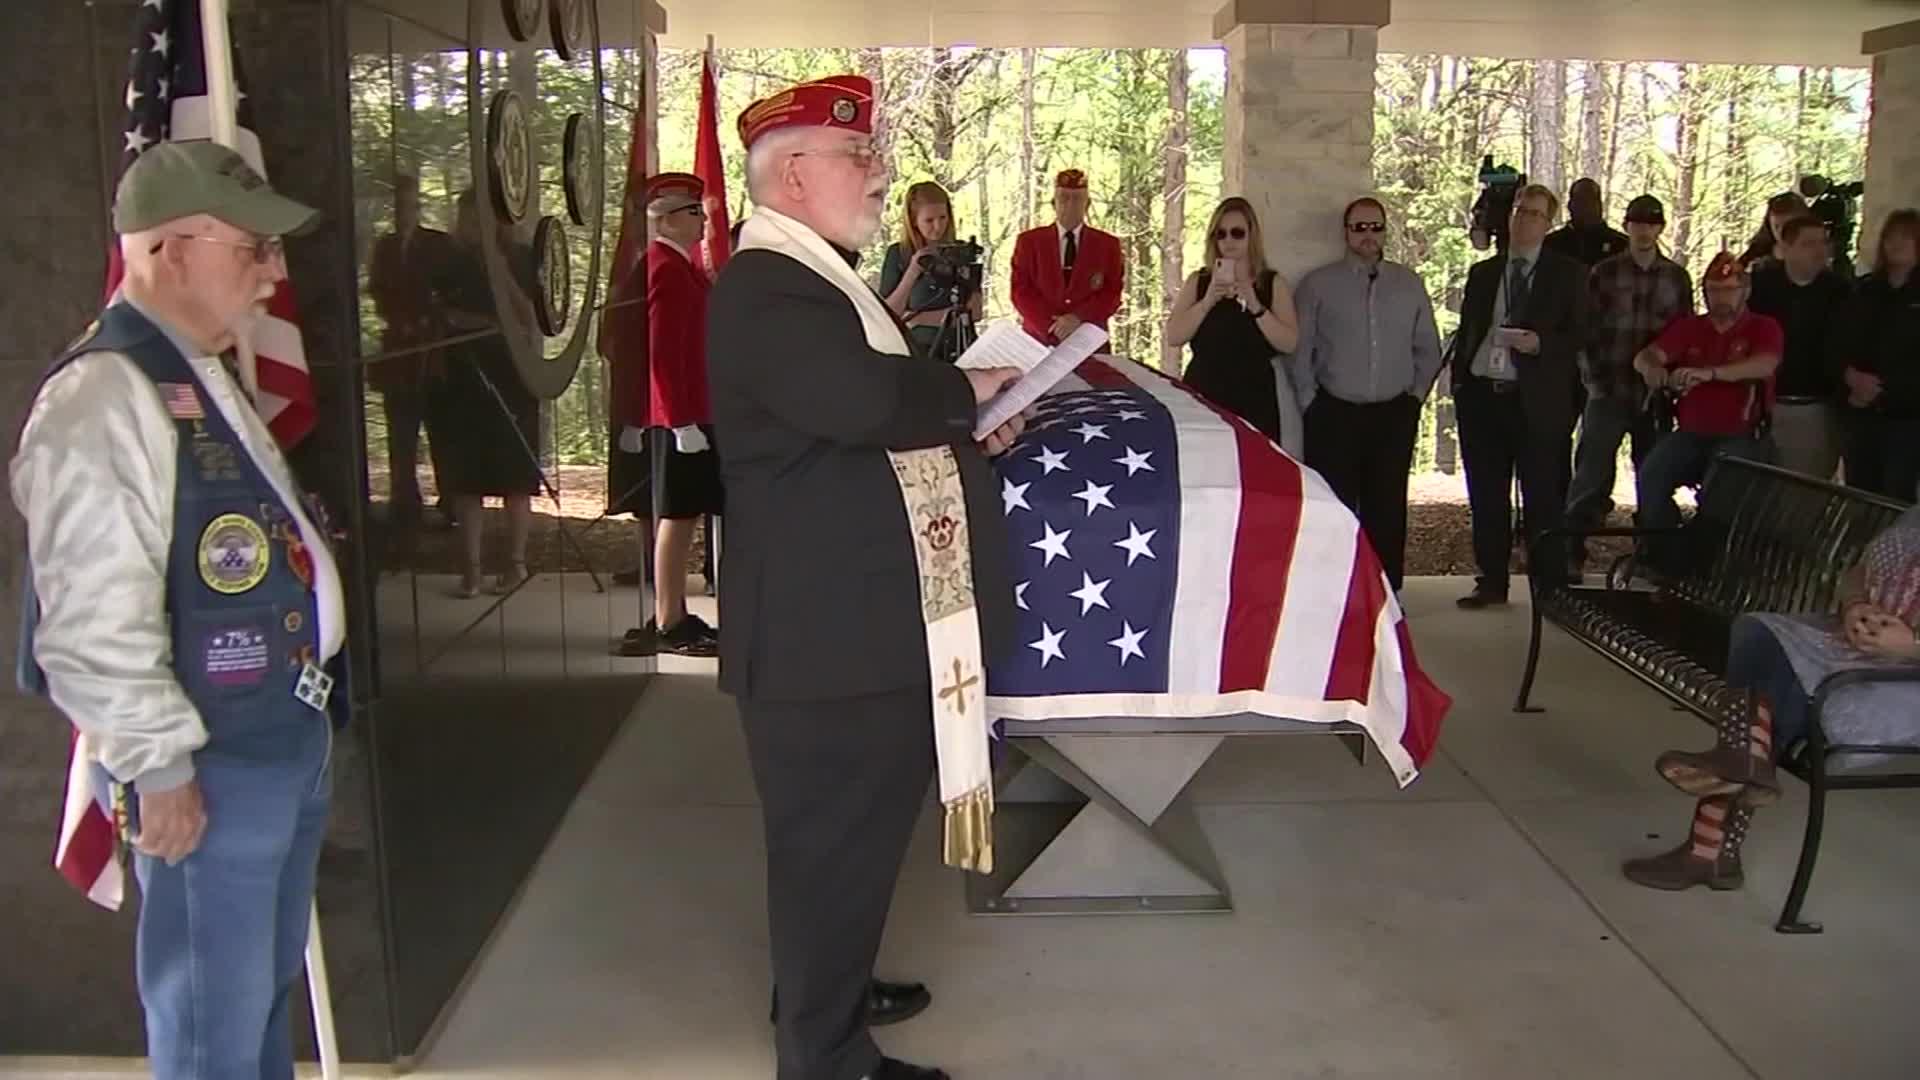 Strangers hold funeral for homeless veteran at Georgia National Cemetery